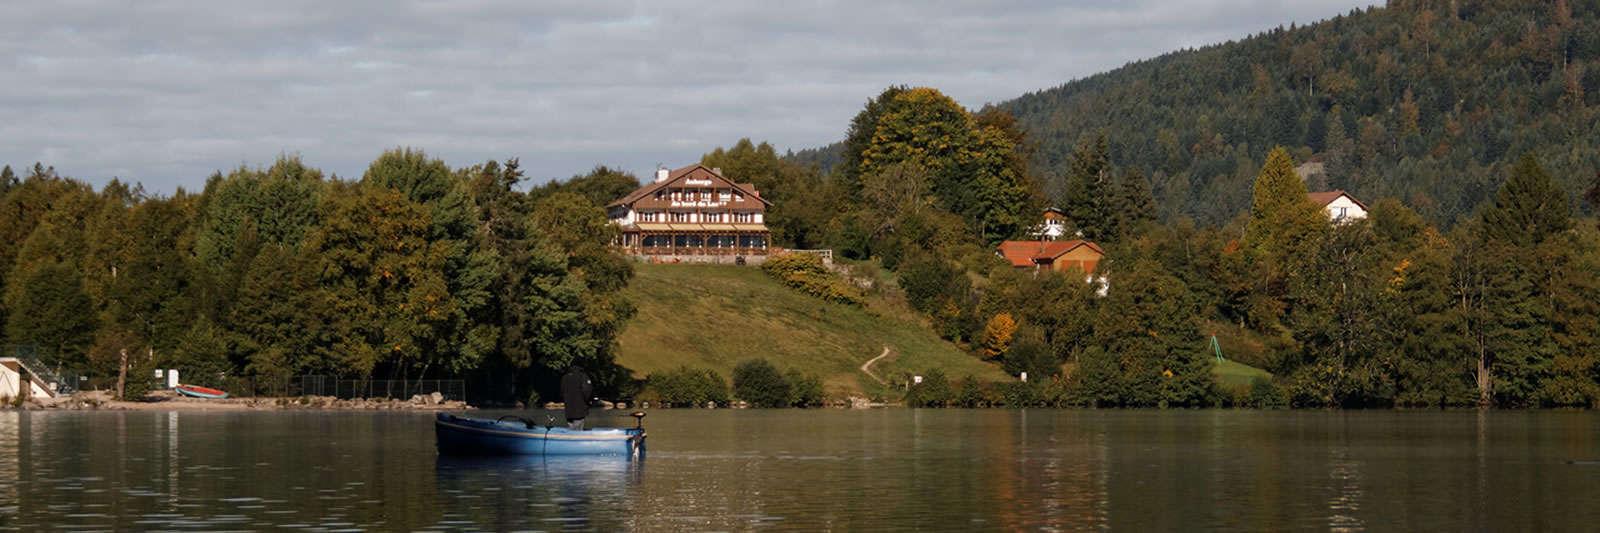 auberge au bord du lac g 233 rardmer h 244 tel restaurant auberge 224 g 233 rardmer